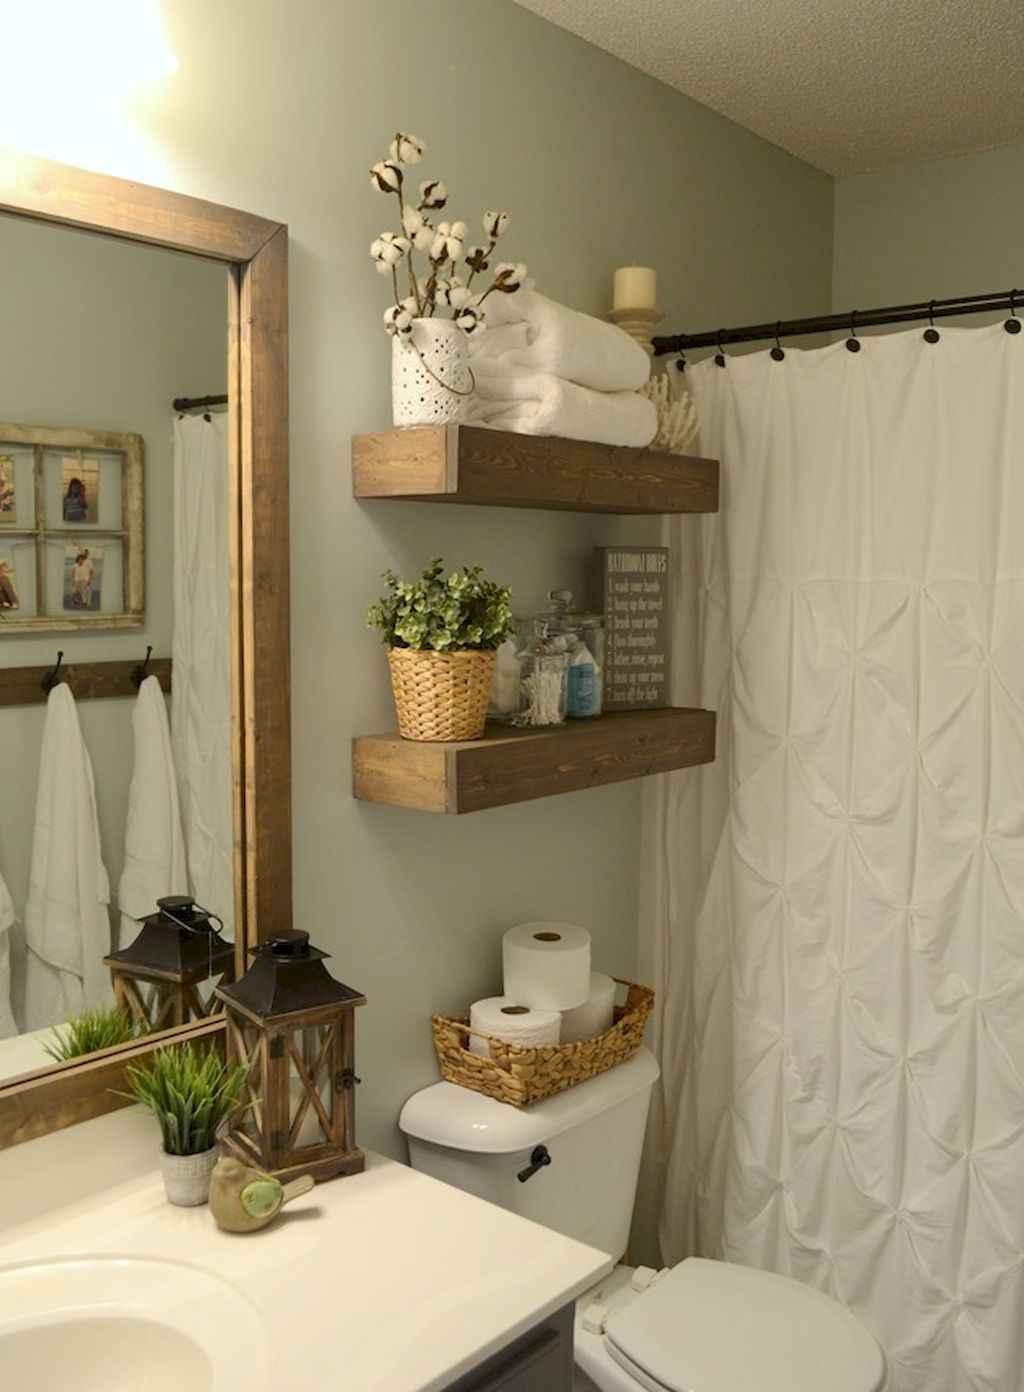 Cool bathroom storage shelves organization ideas (44)